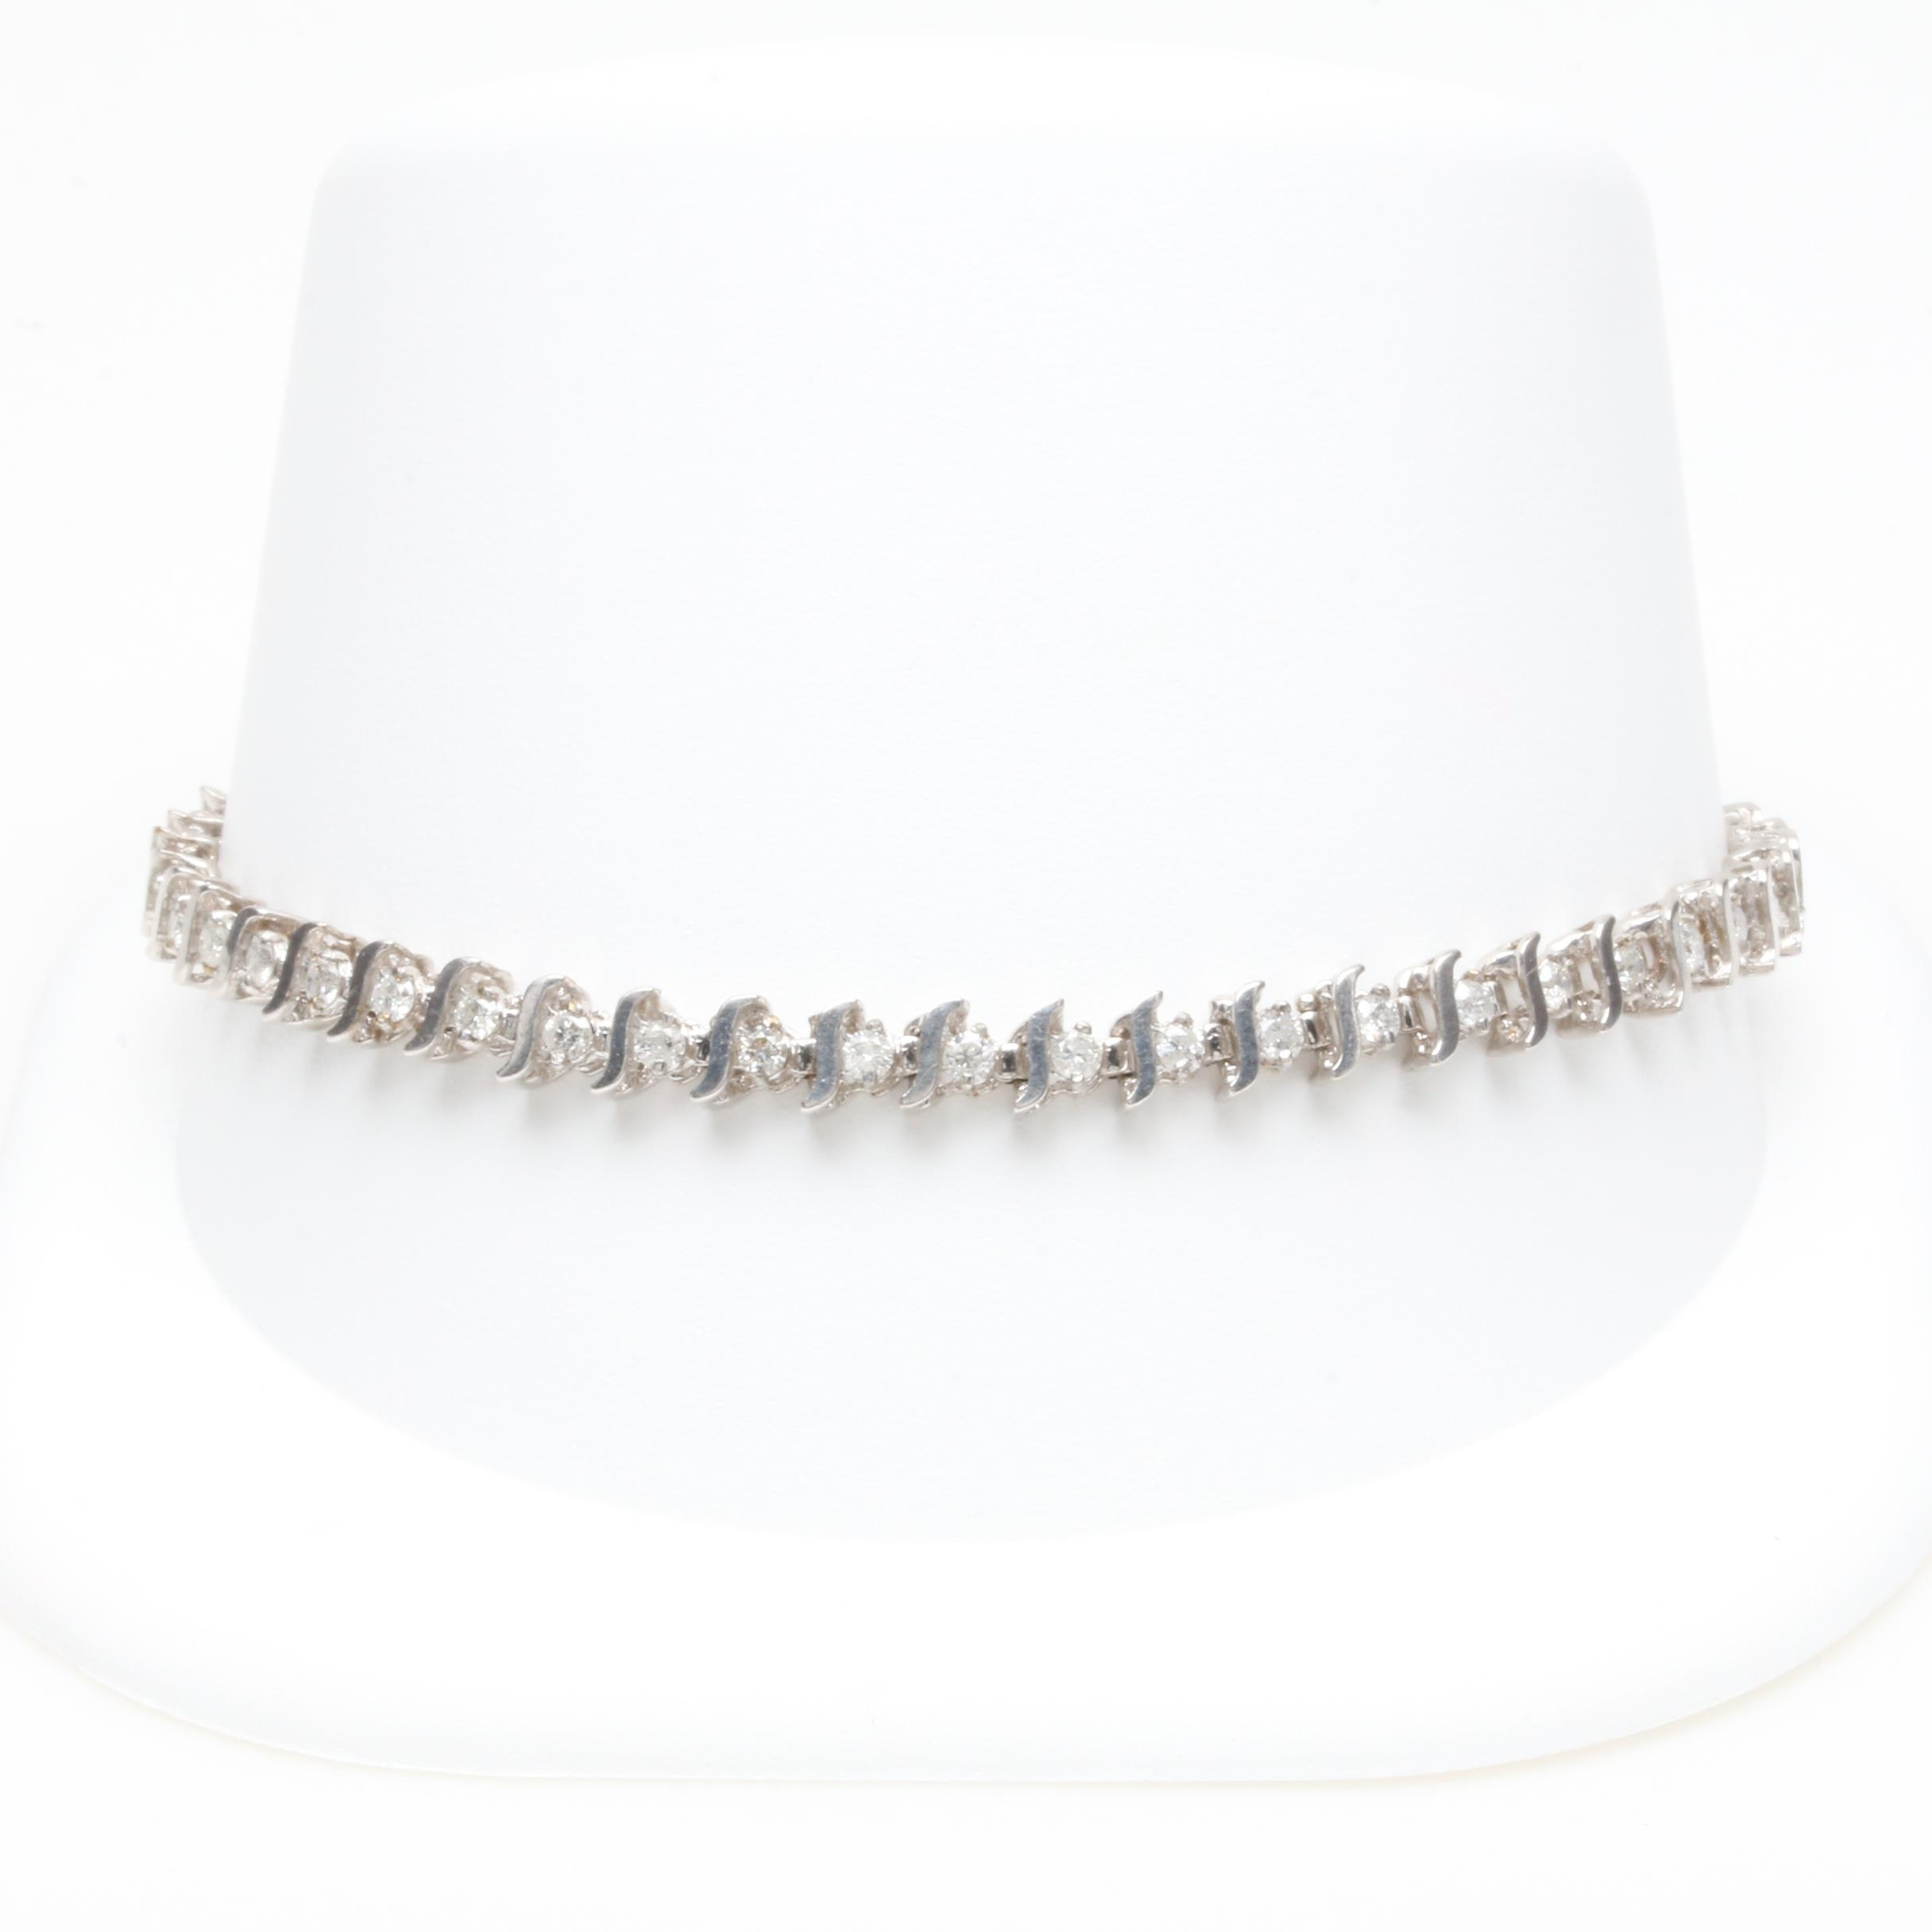 10K White Gold 1.45 CTW Diamond Tennis Bracelet